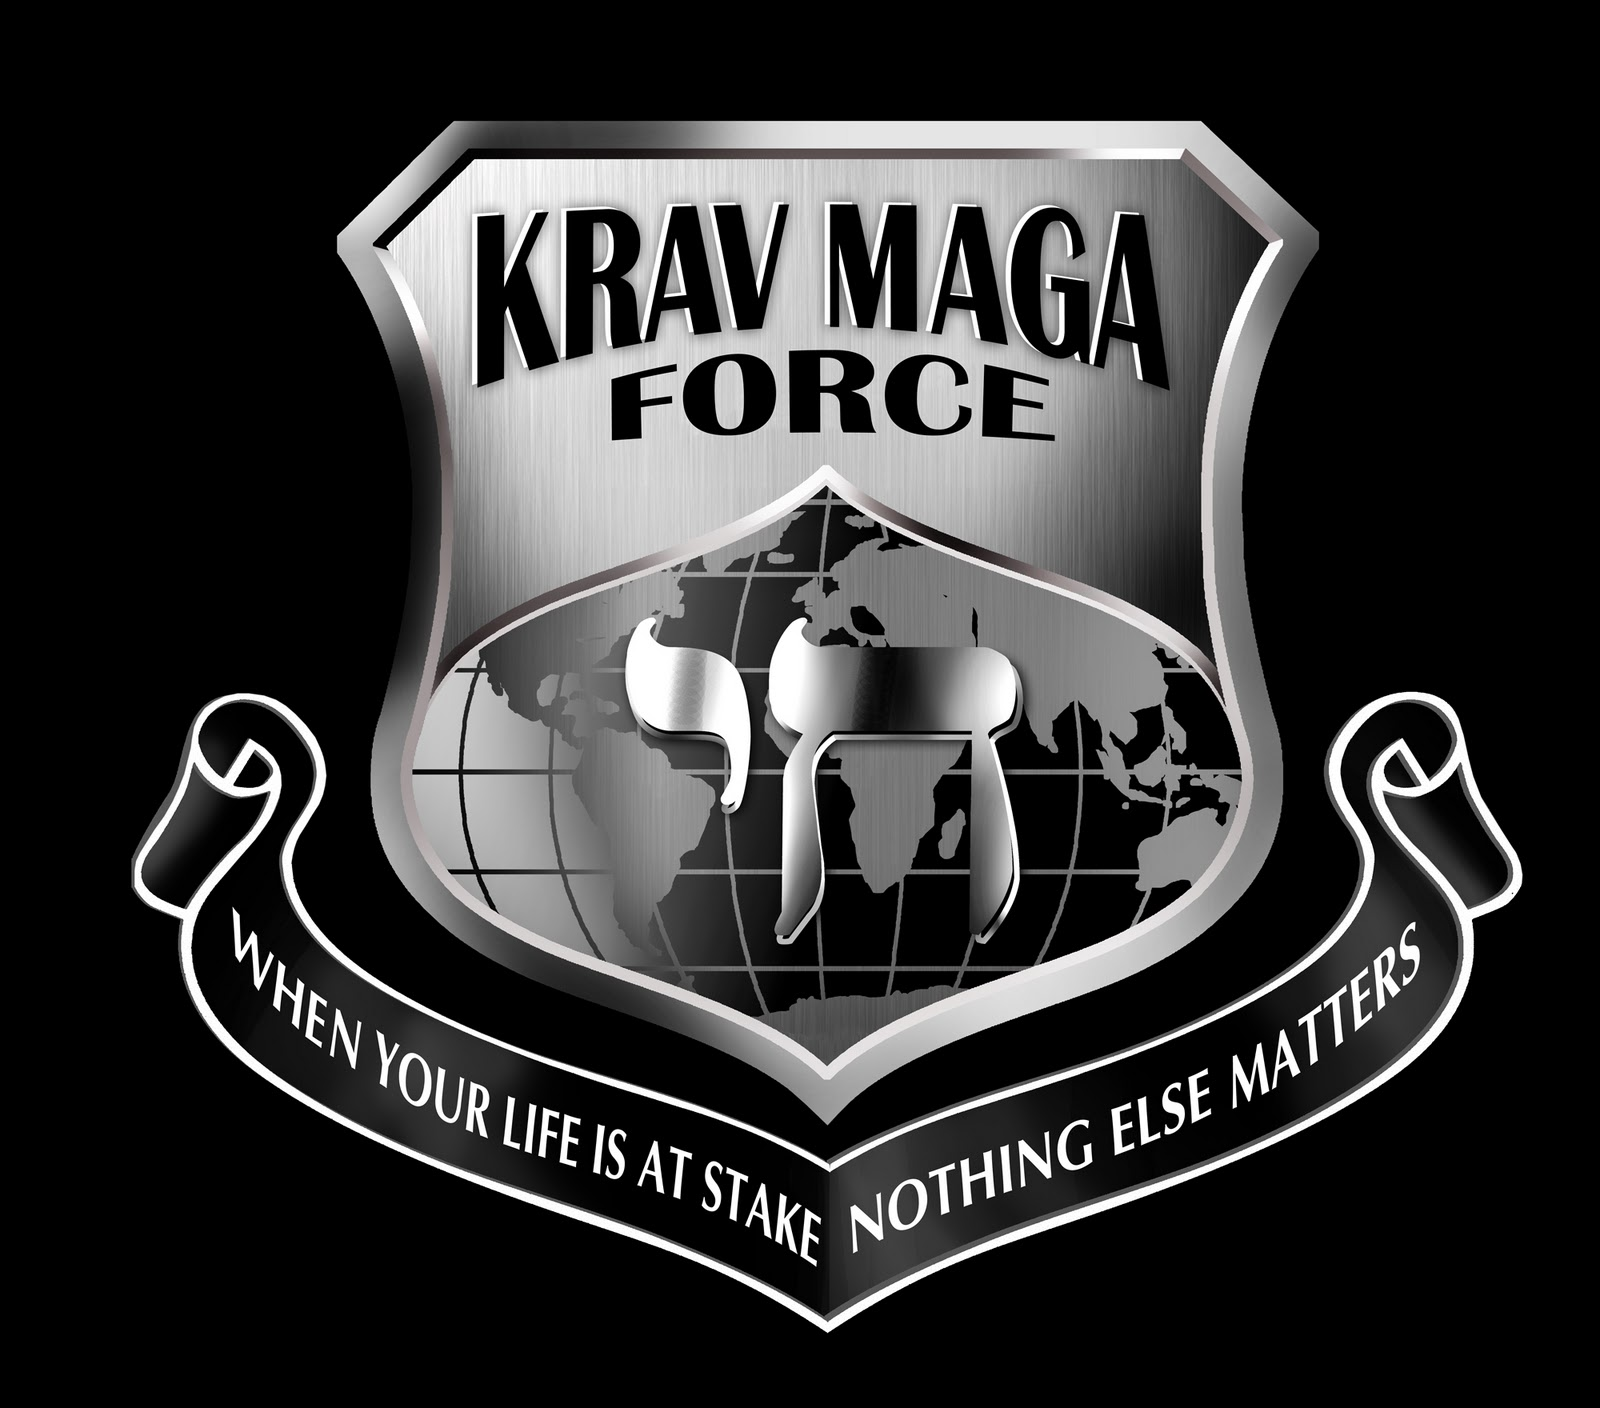 Krav maga force bc mma aficionados the core foundation of krav maga force is based upon the military and krav maga experience of its founders the krav maga force curriculum was developed buycottarizona